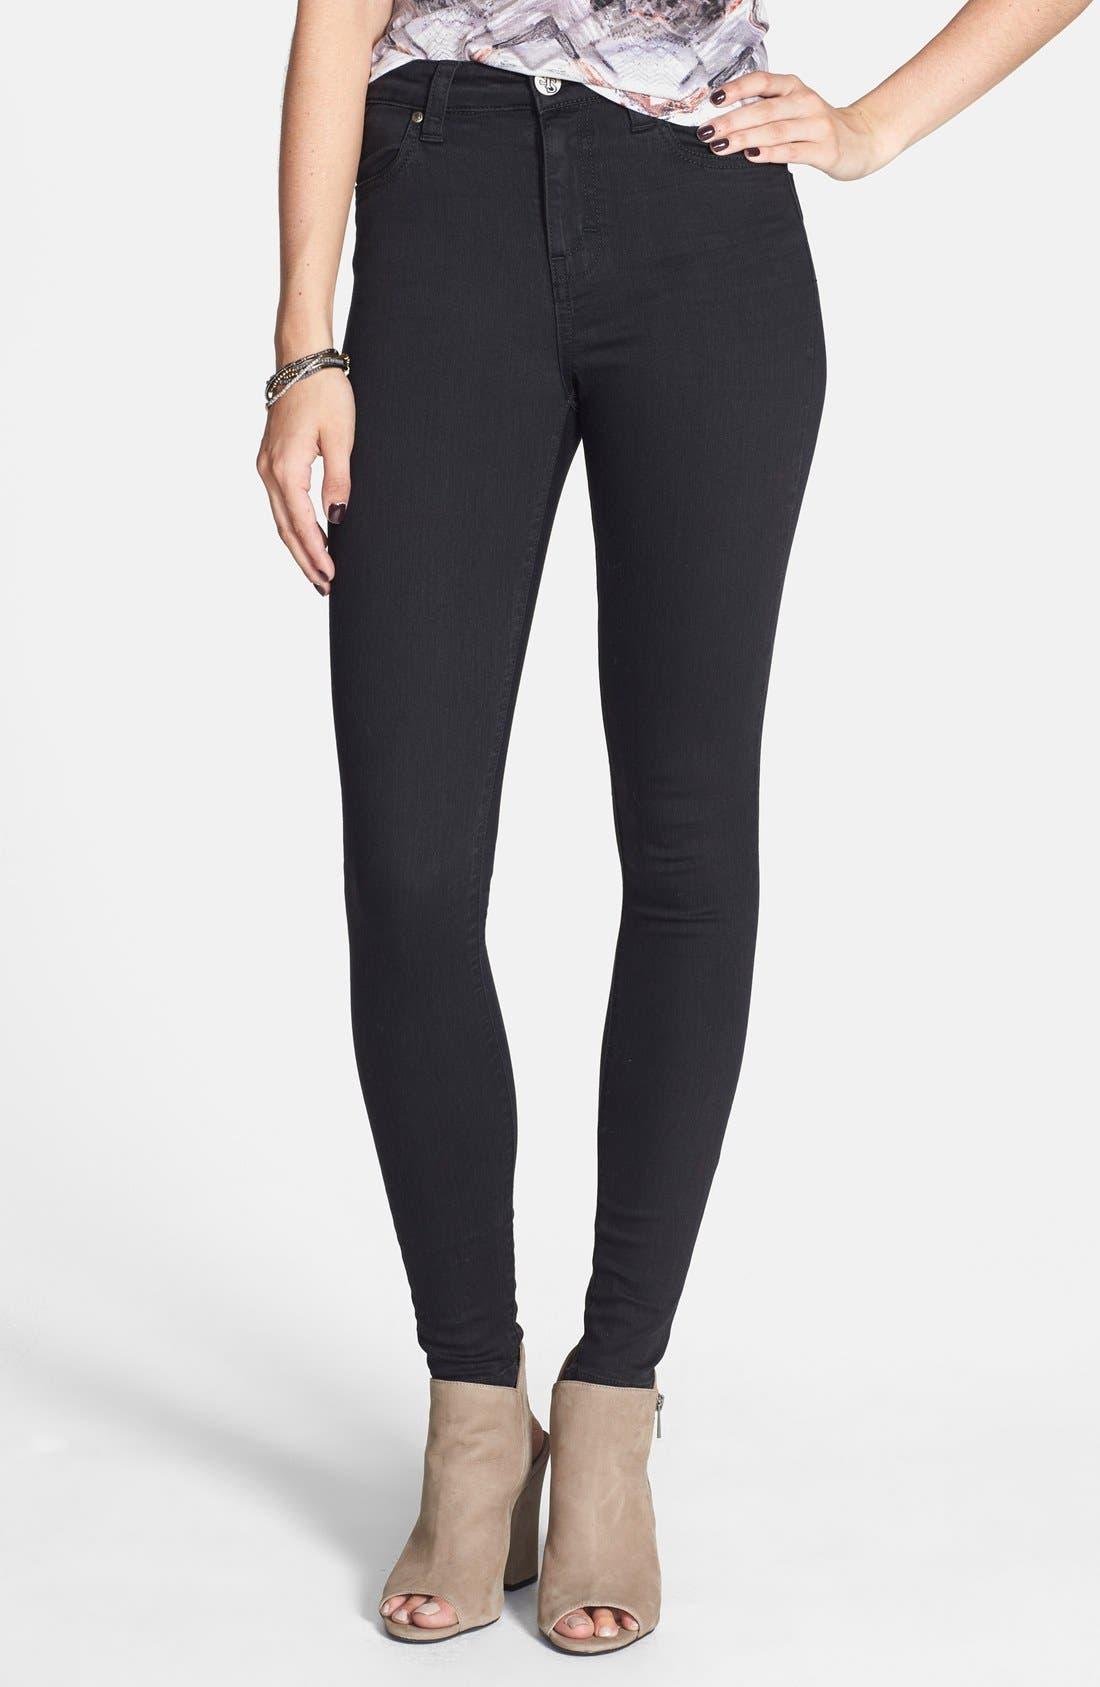 Alternate Image 1 Selected - STS Blue 'Elle' High Waist Skinny Jeans